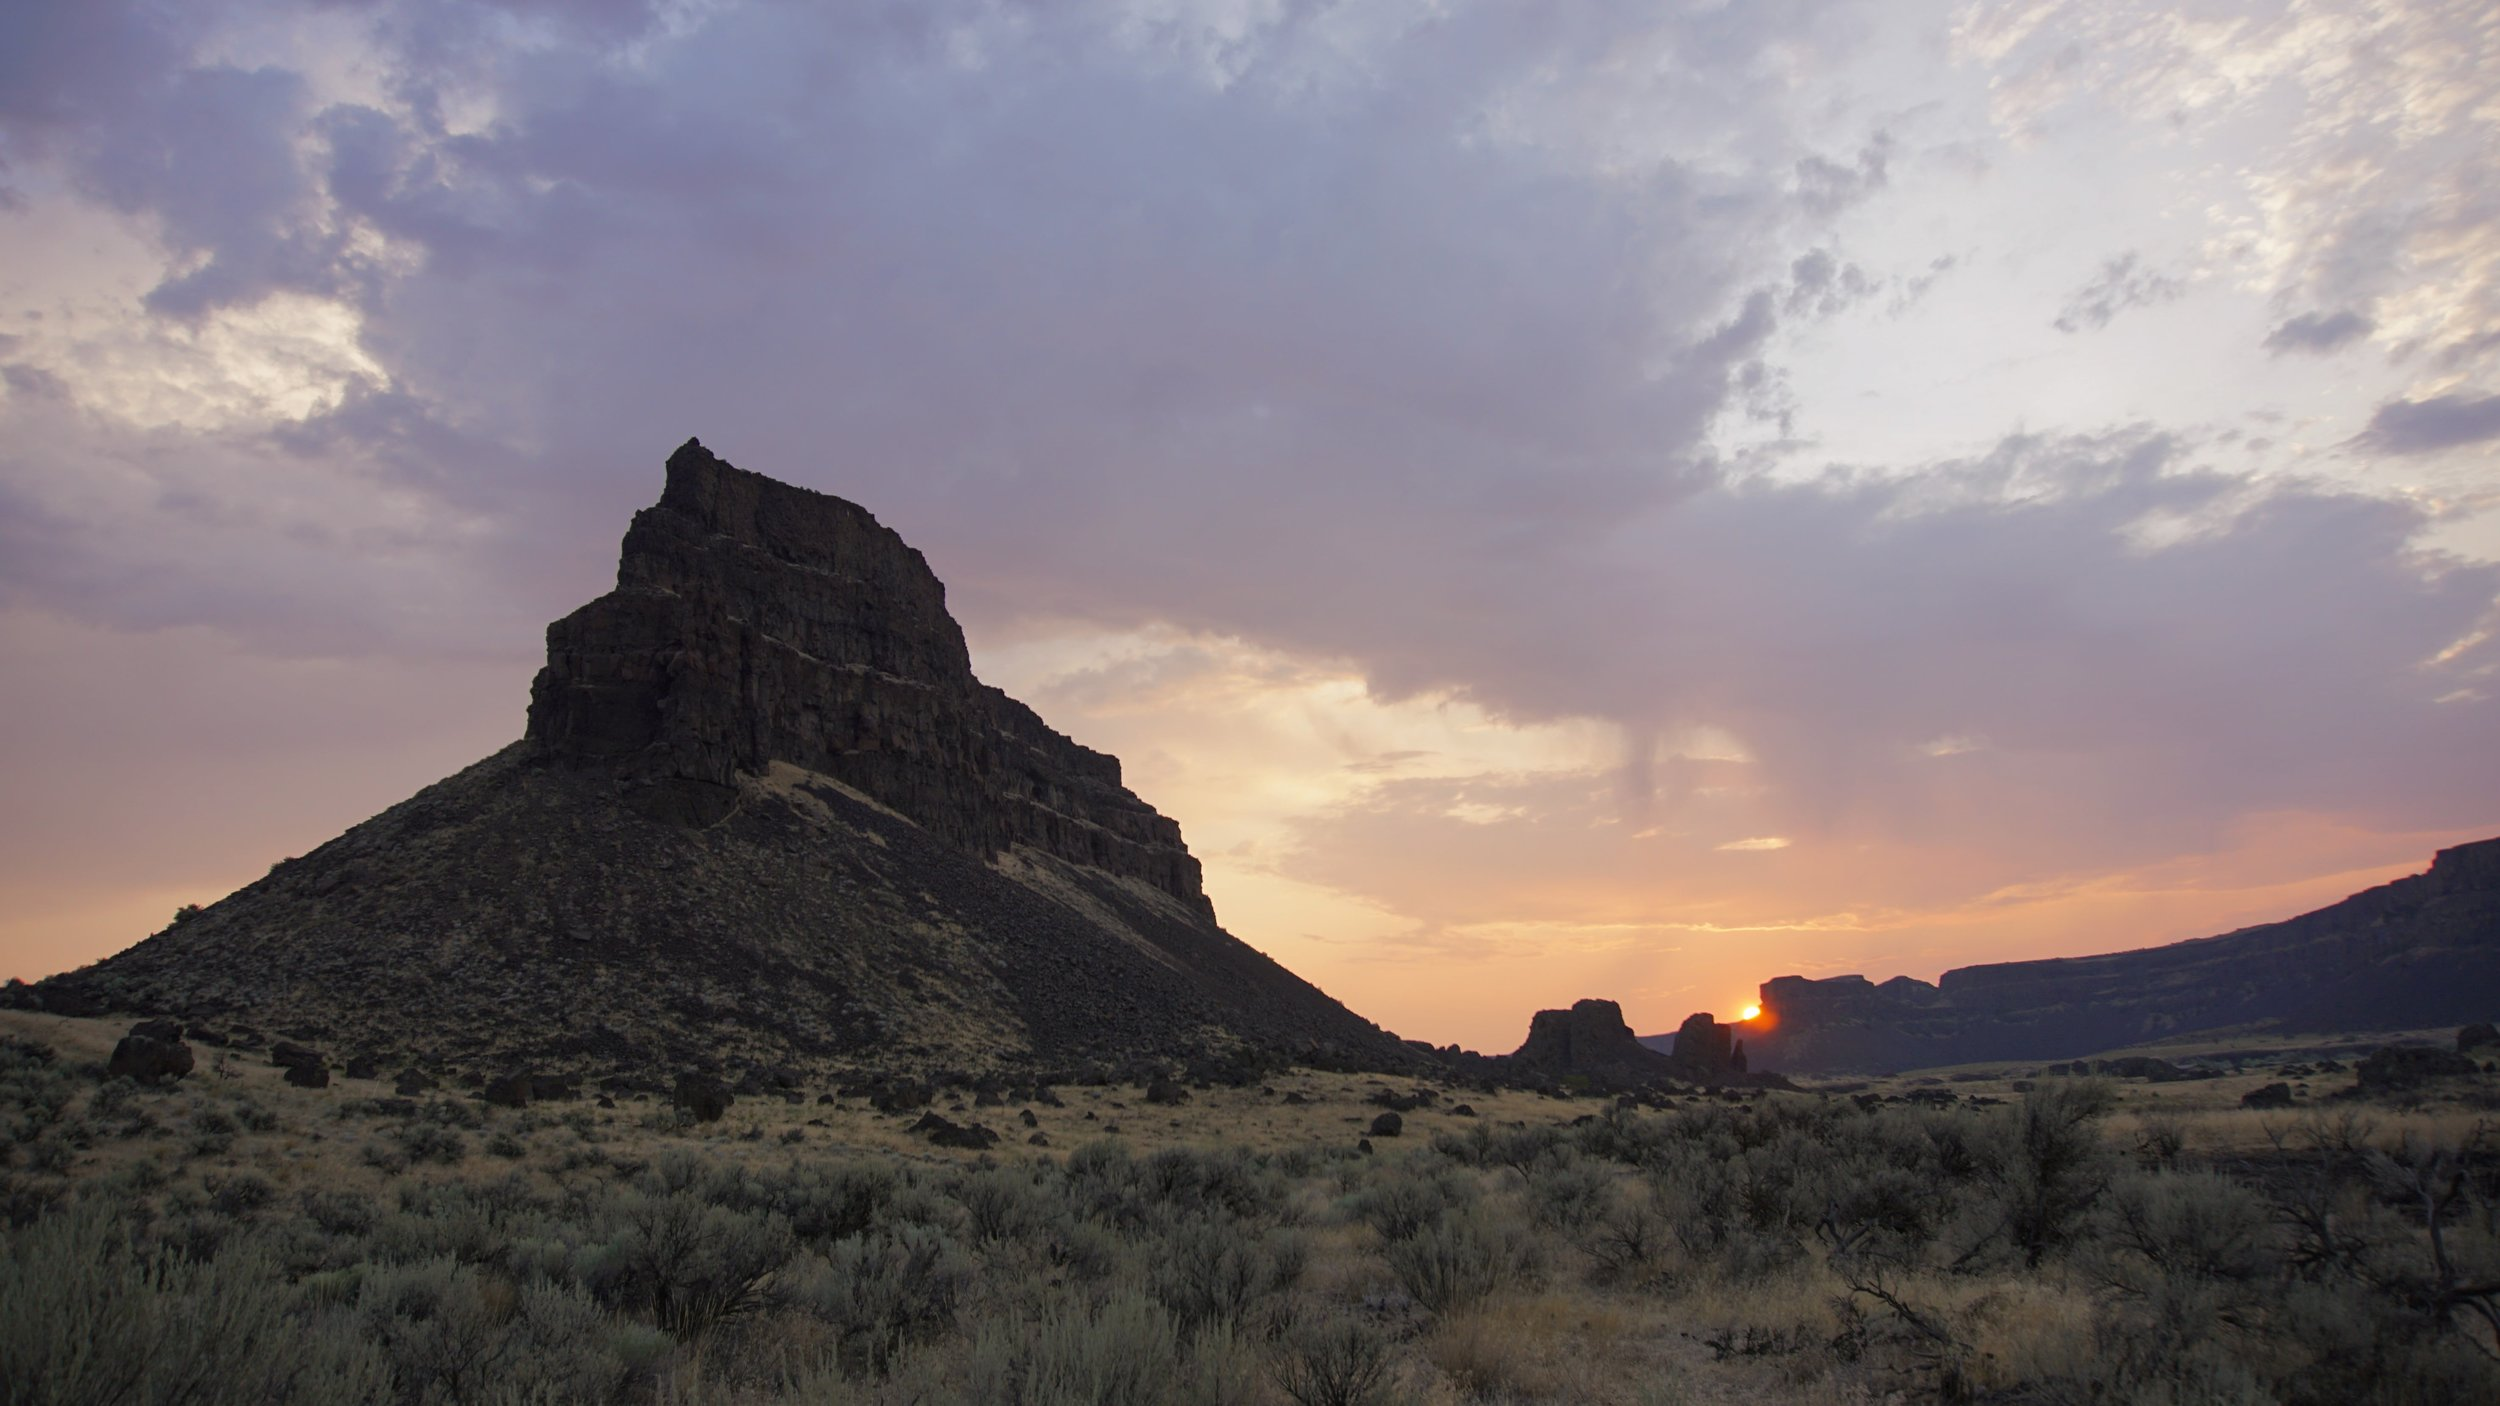 Umatilla Rock at sunrise